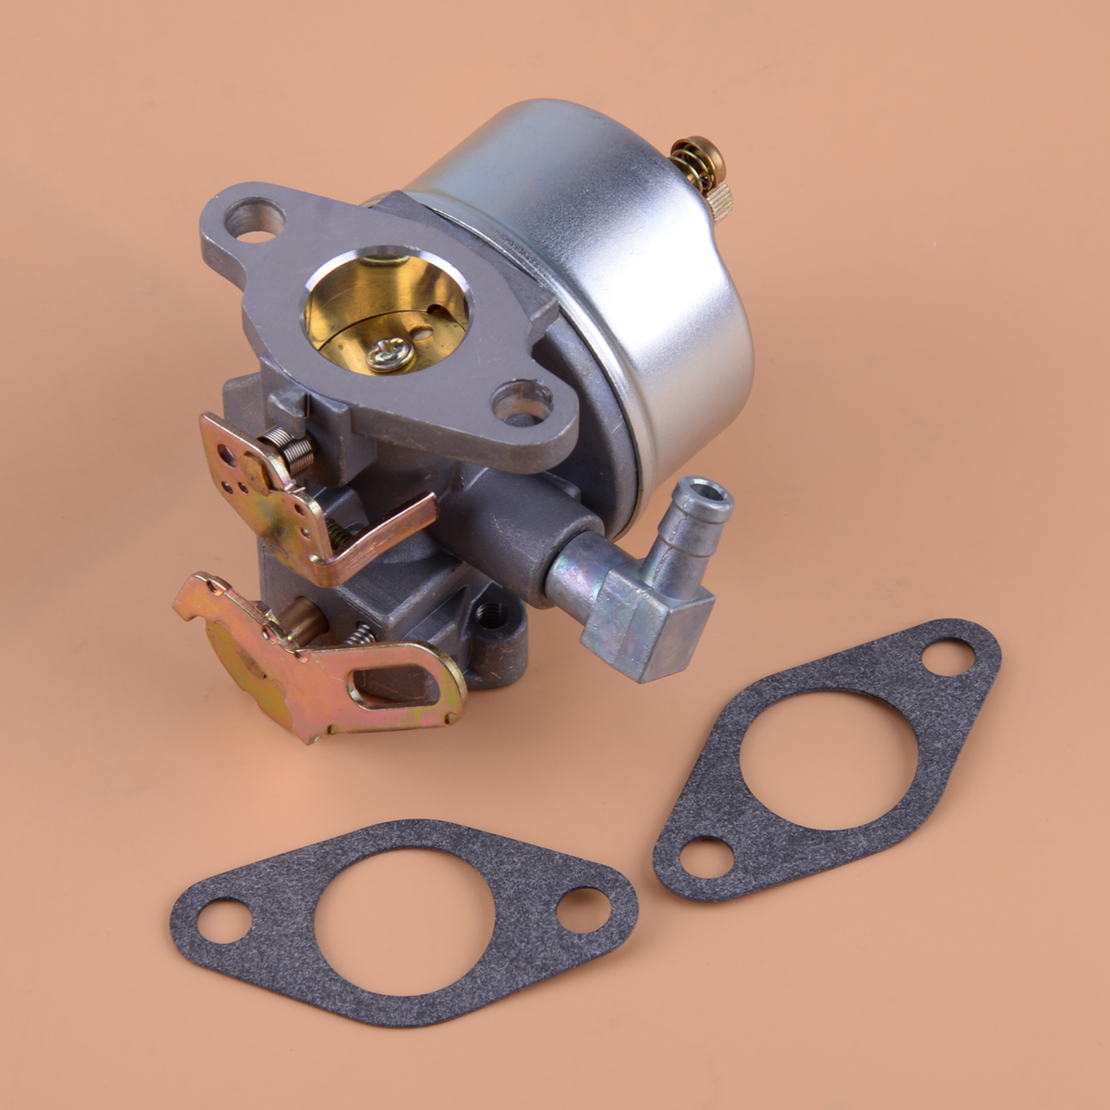 Adjustable Carburetor Fit For Tecumseh Snapper Yardman 421 521 4HP 5HP Snow Blower 640084B 632107A 632107 640084A